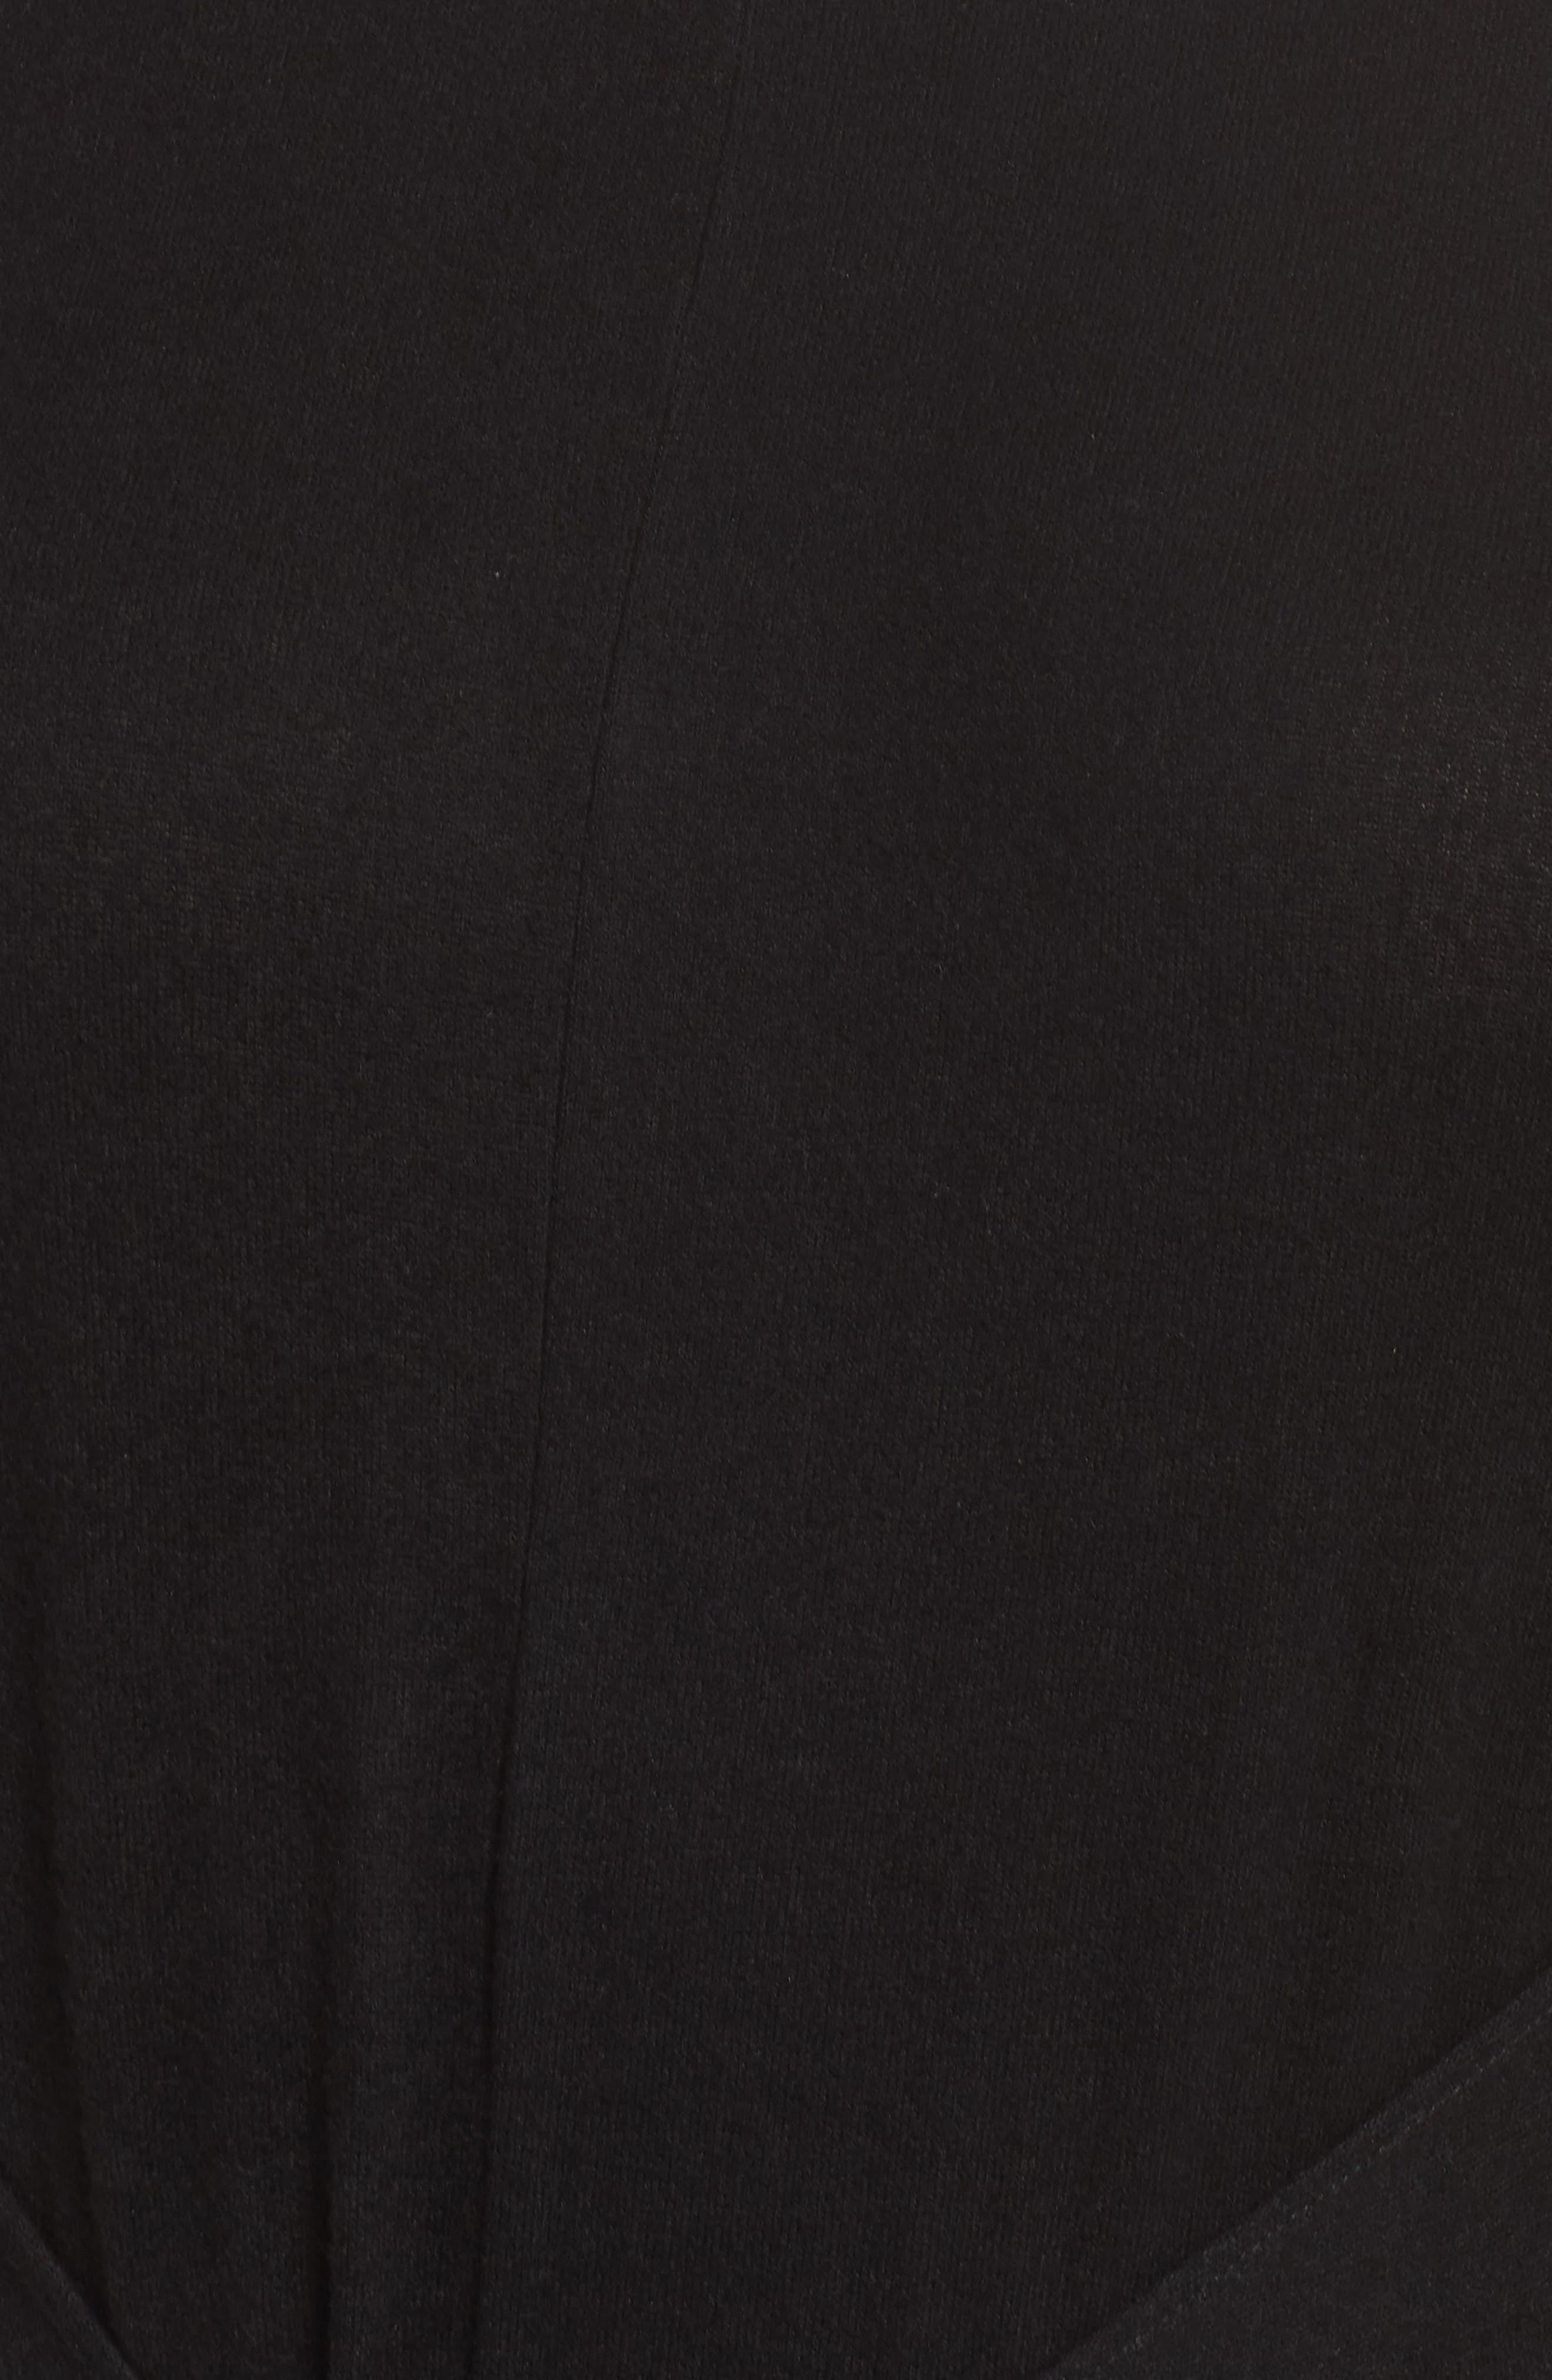 Off-Duty Tie Front Knit Dress,                             Alternate thumbnail 6, color,                             001